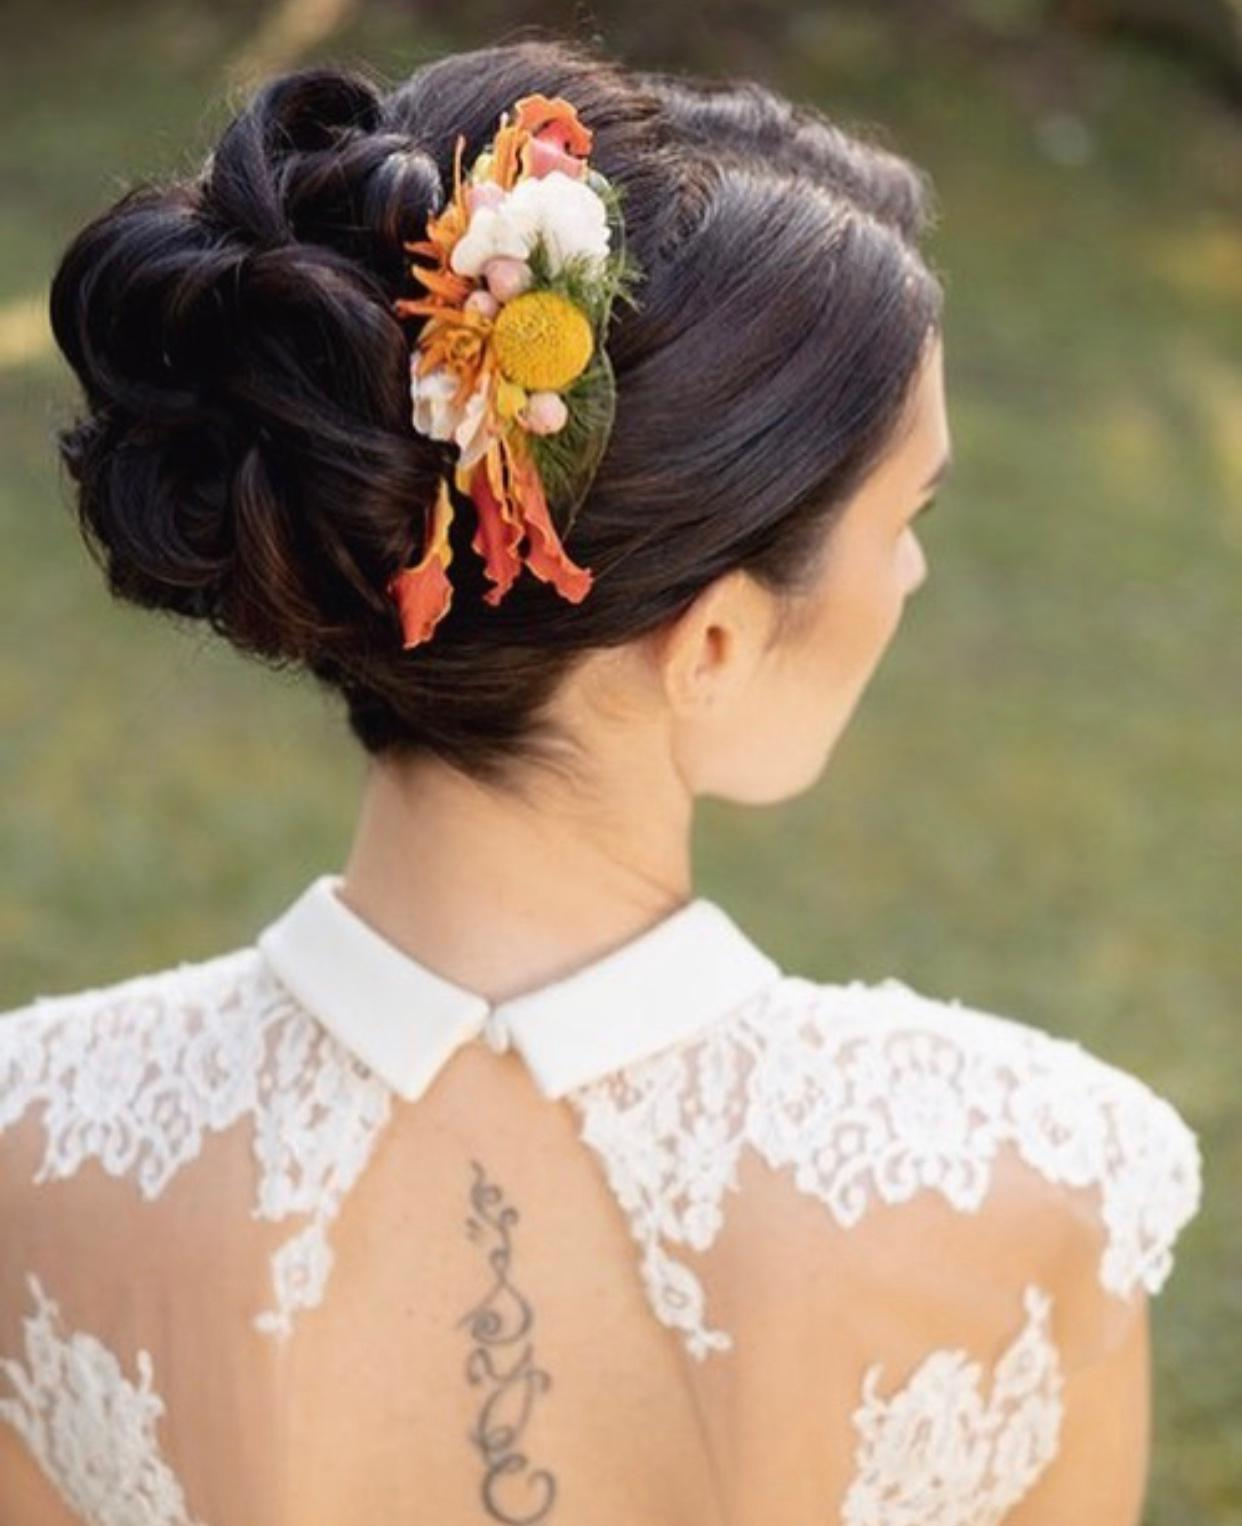 aml-nantes-emmanuelle-coiffure-lissage-04-29-1